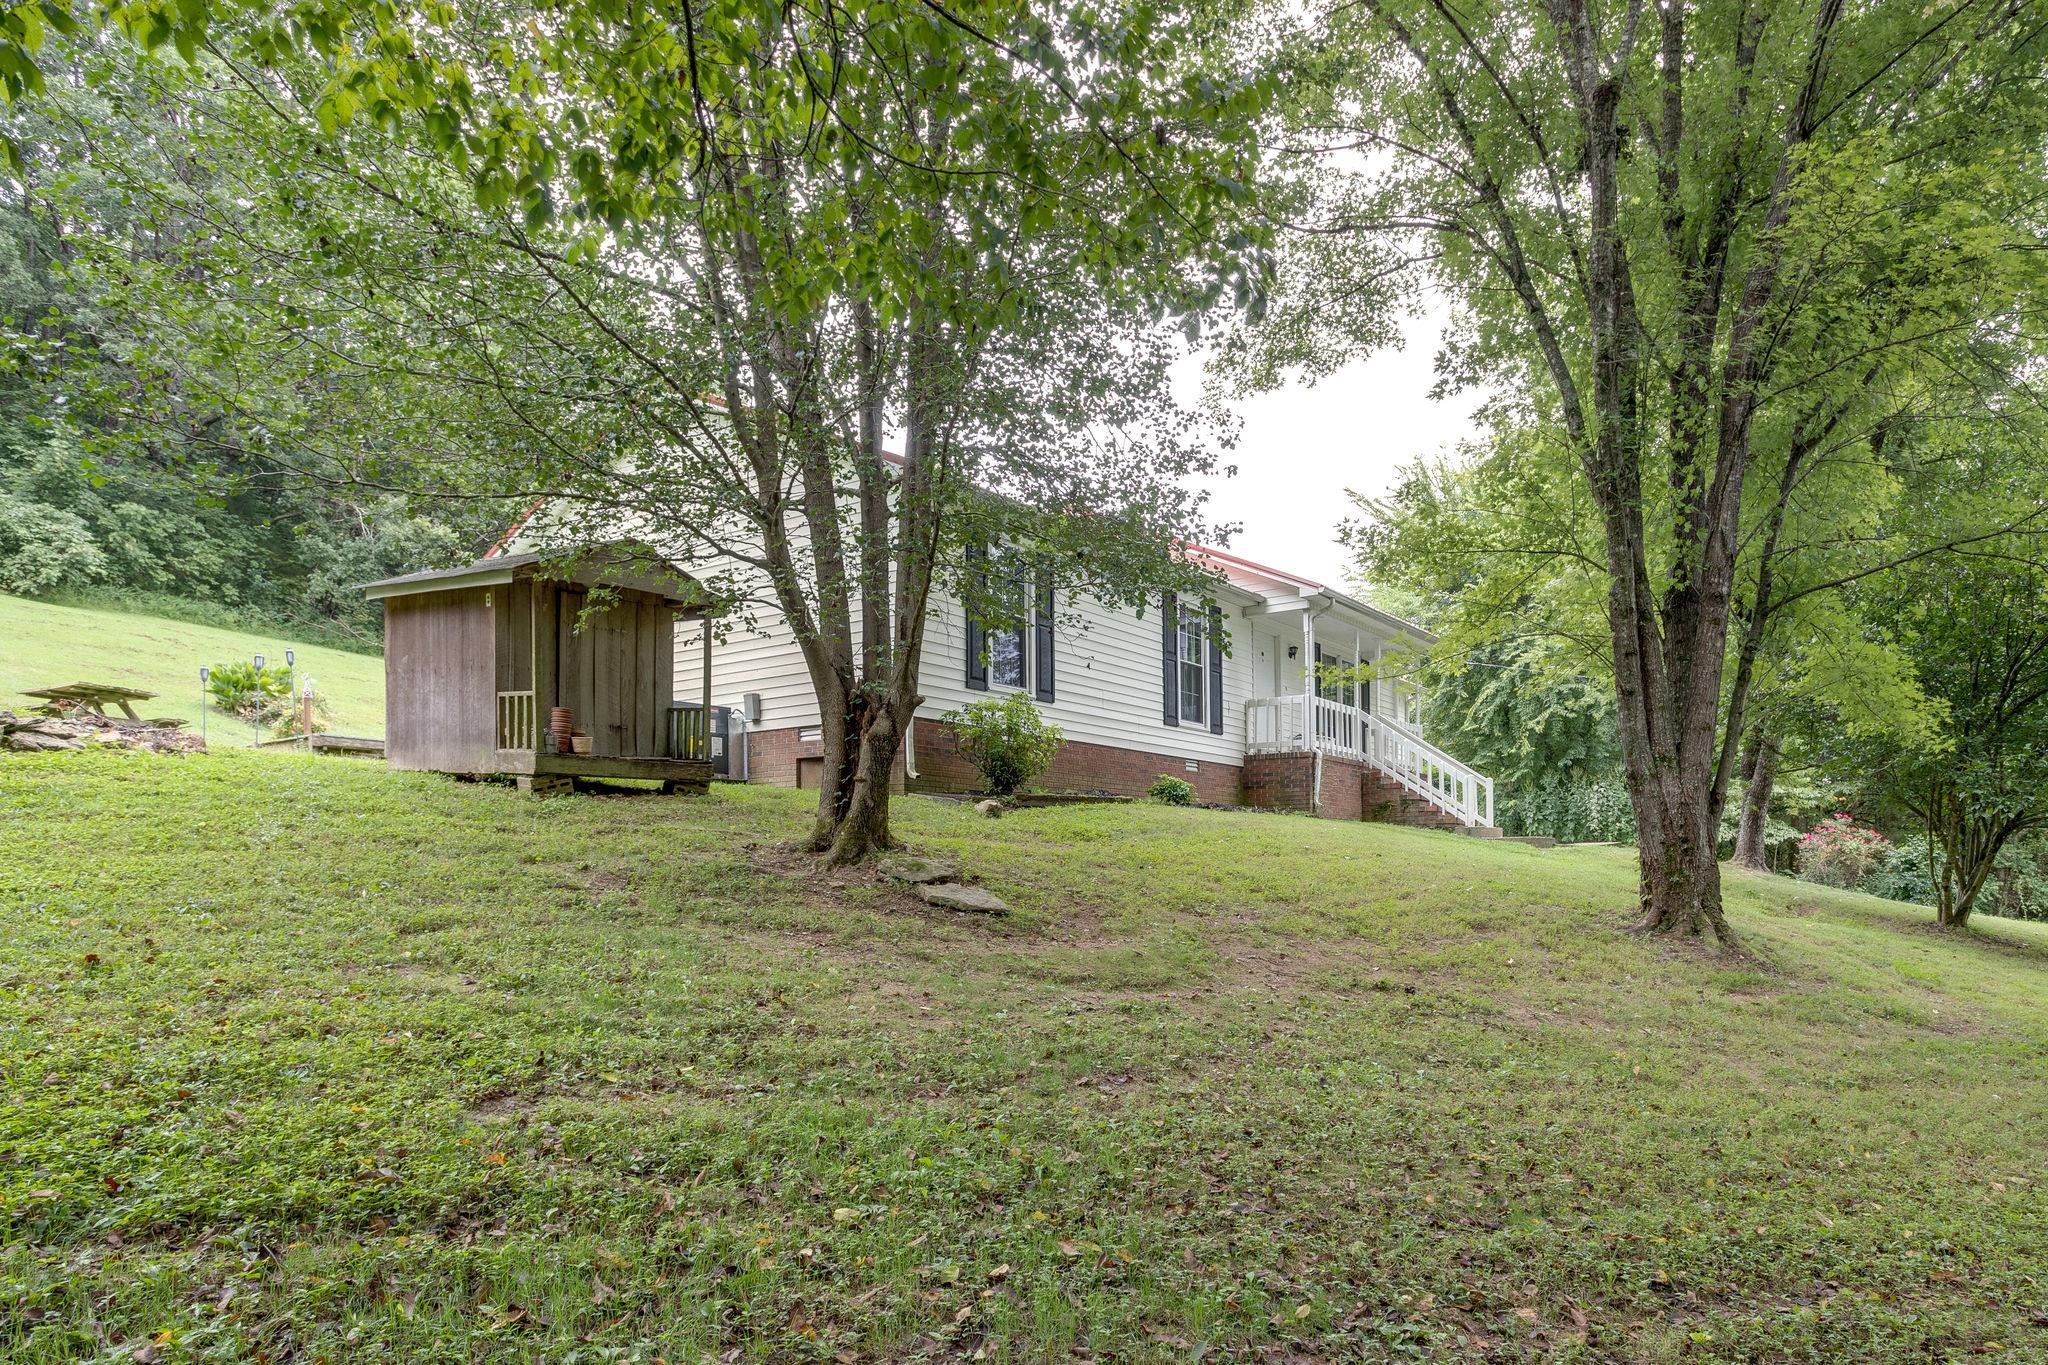 16864 Columbia Hwy, Lynnville, TN 38472 - Lynnville, TN real estate listing